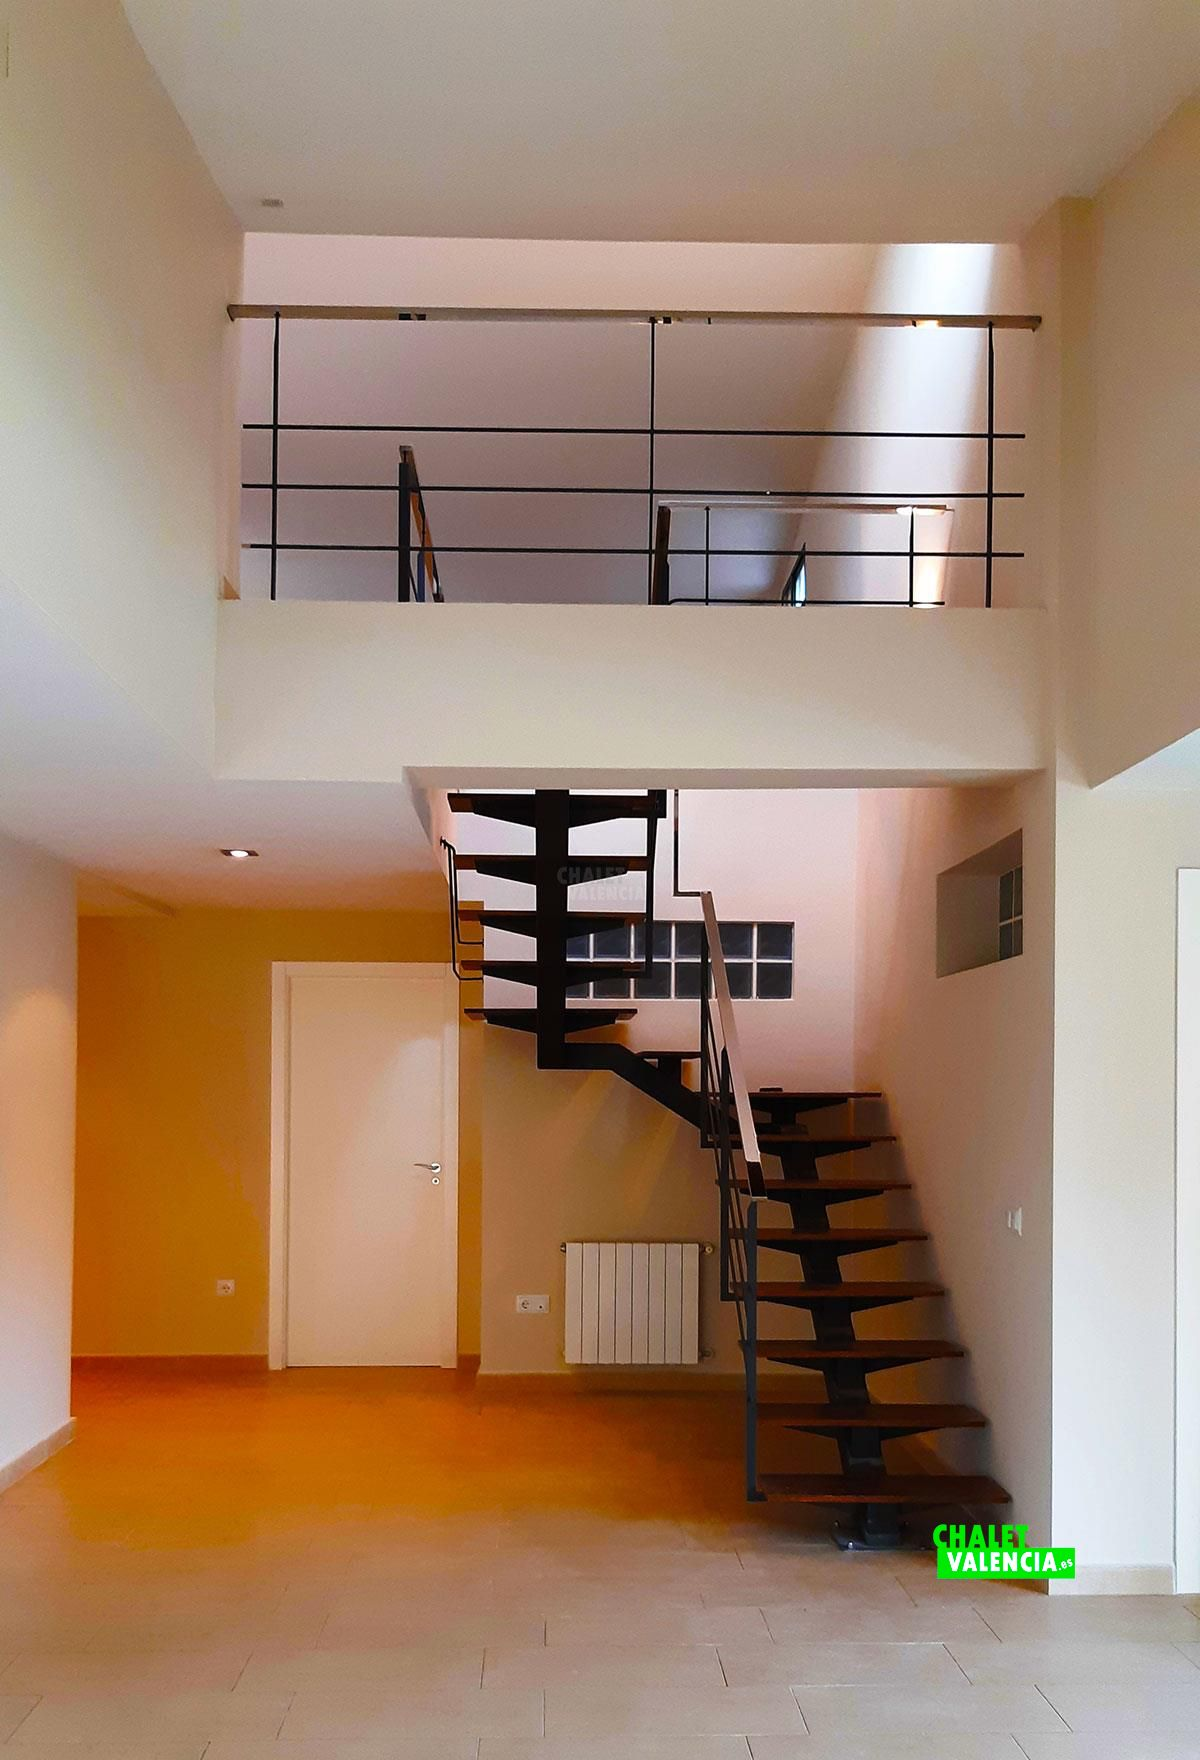 25500-escaleras-leliana-chalet-valencia